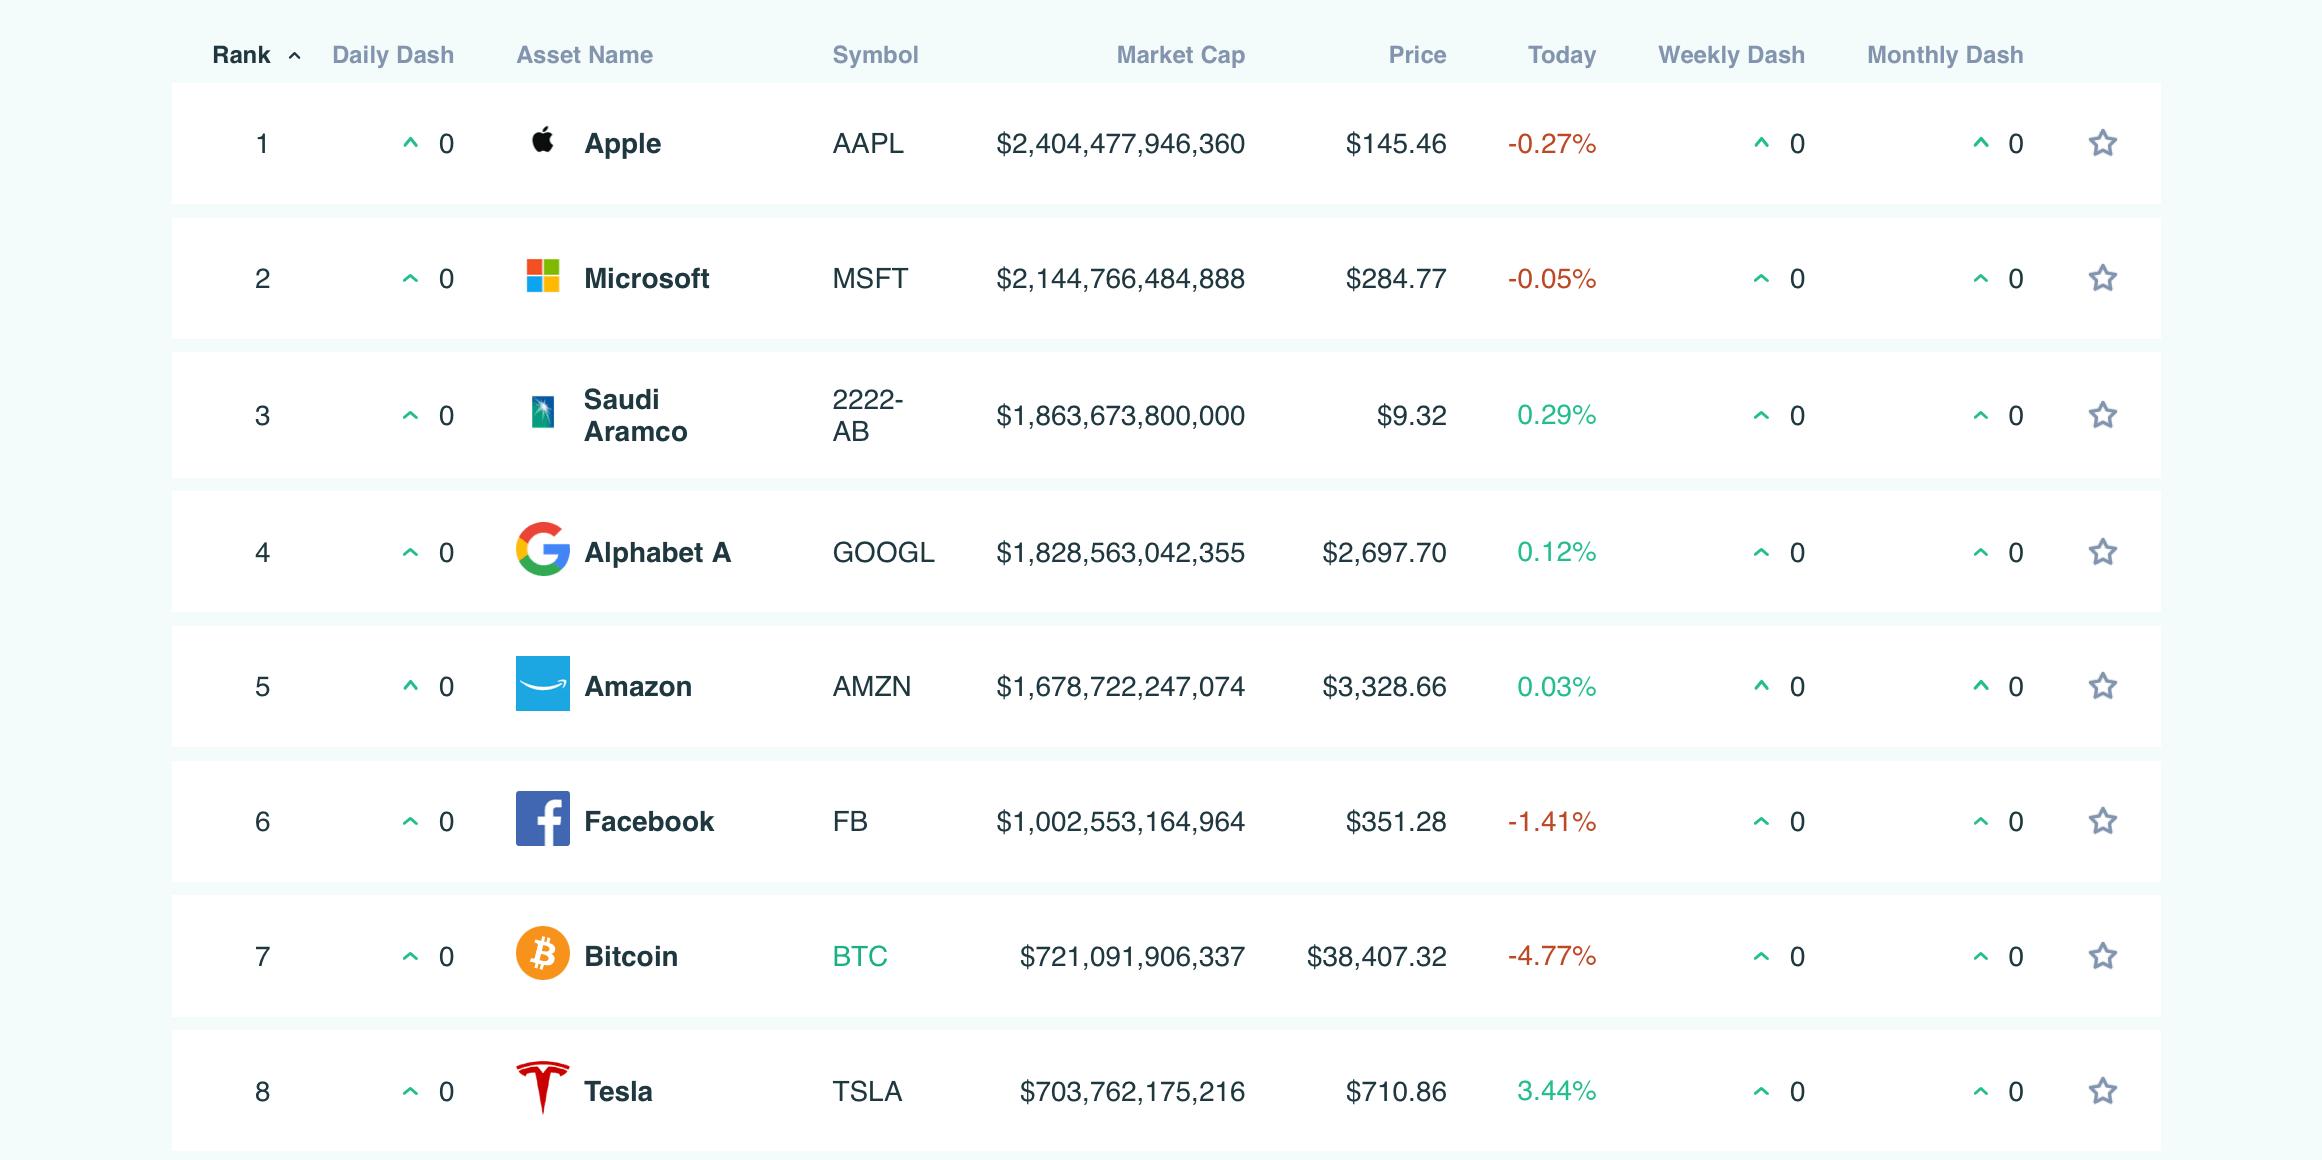 компании биткоин капитализация